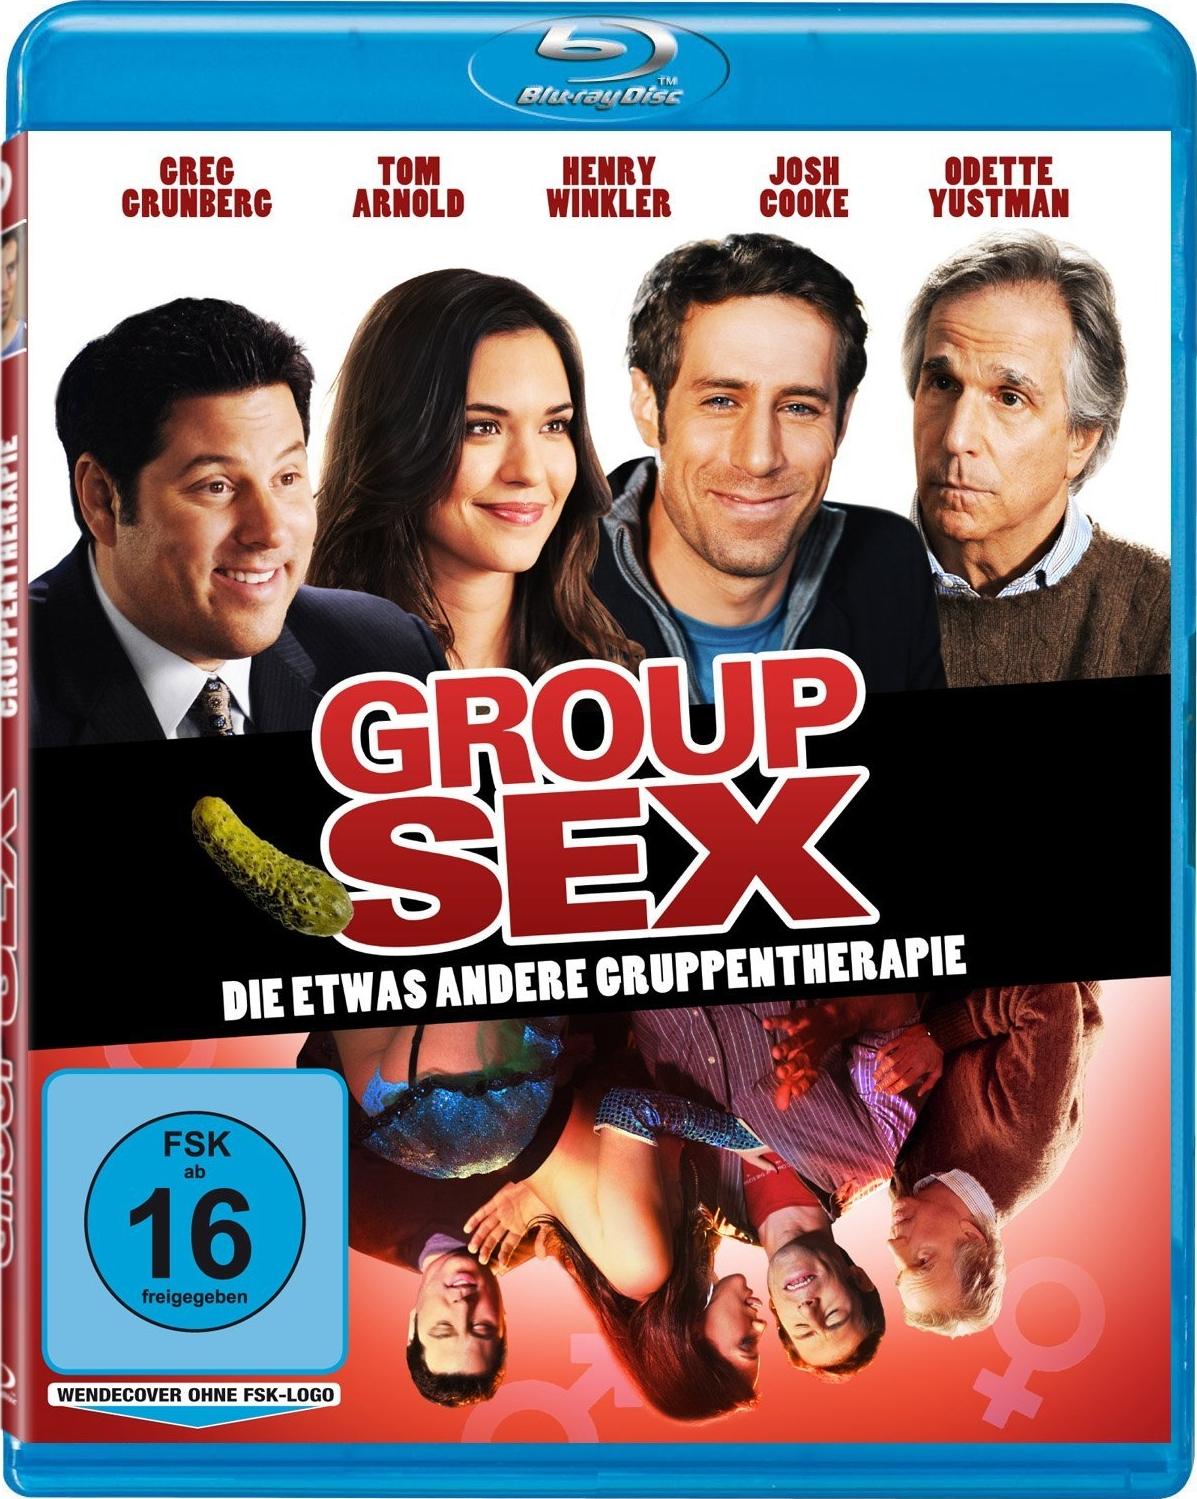 Group sex the movie 2010